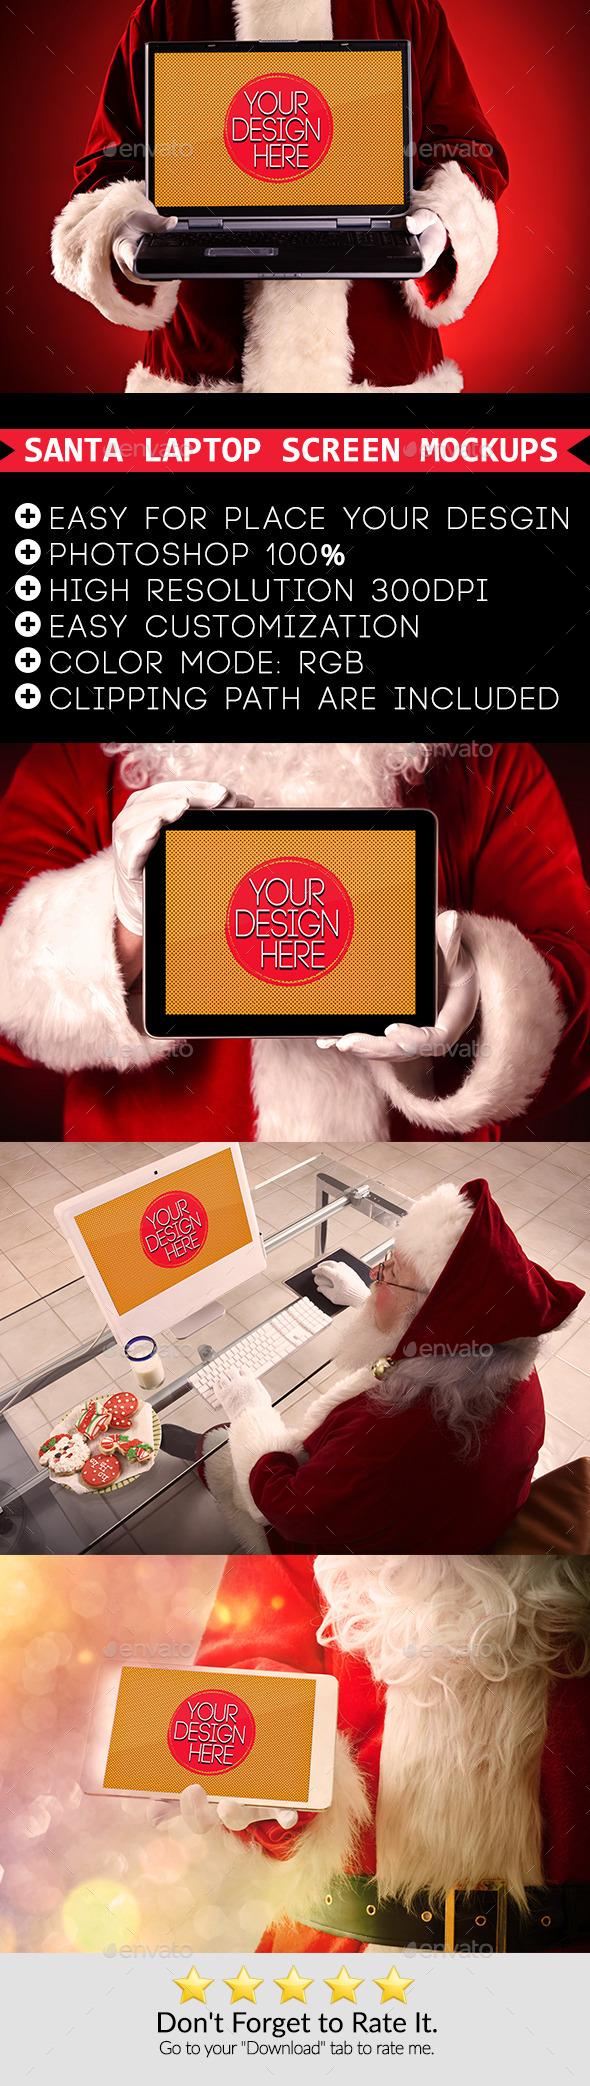 Santa Laptop Screen mockups - Laptop Displays